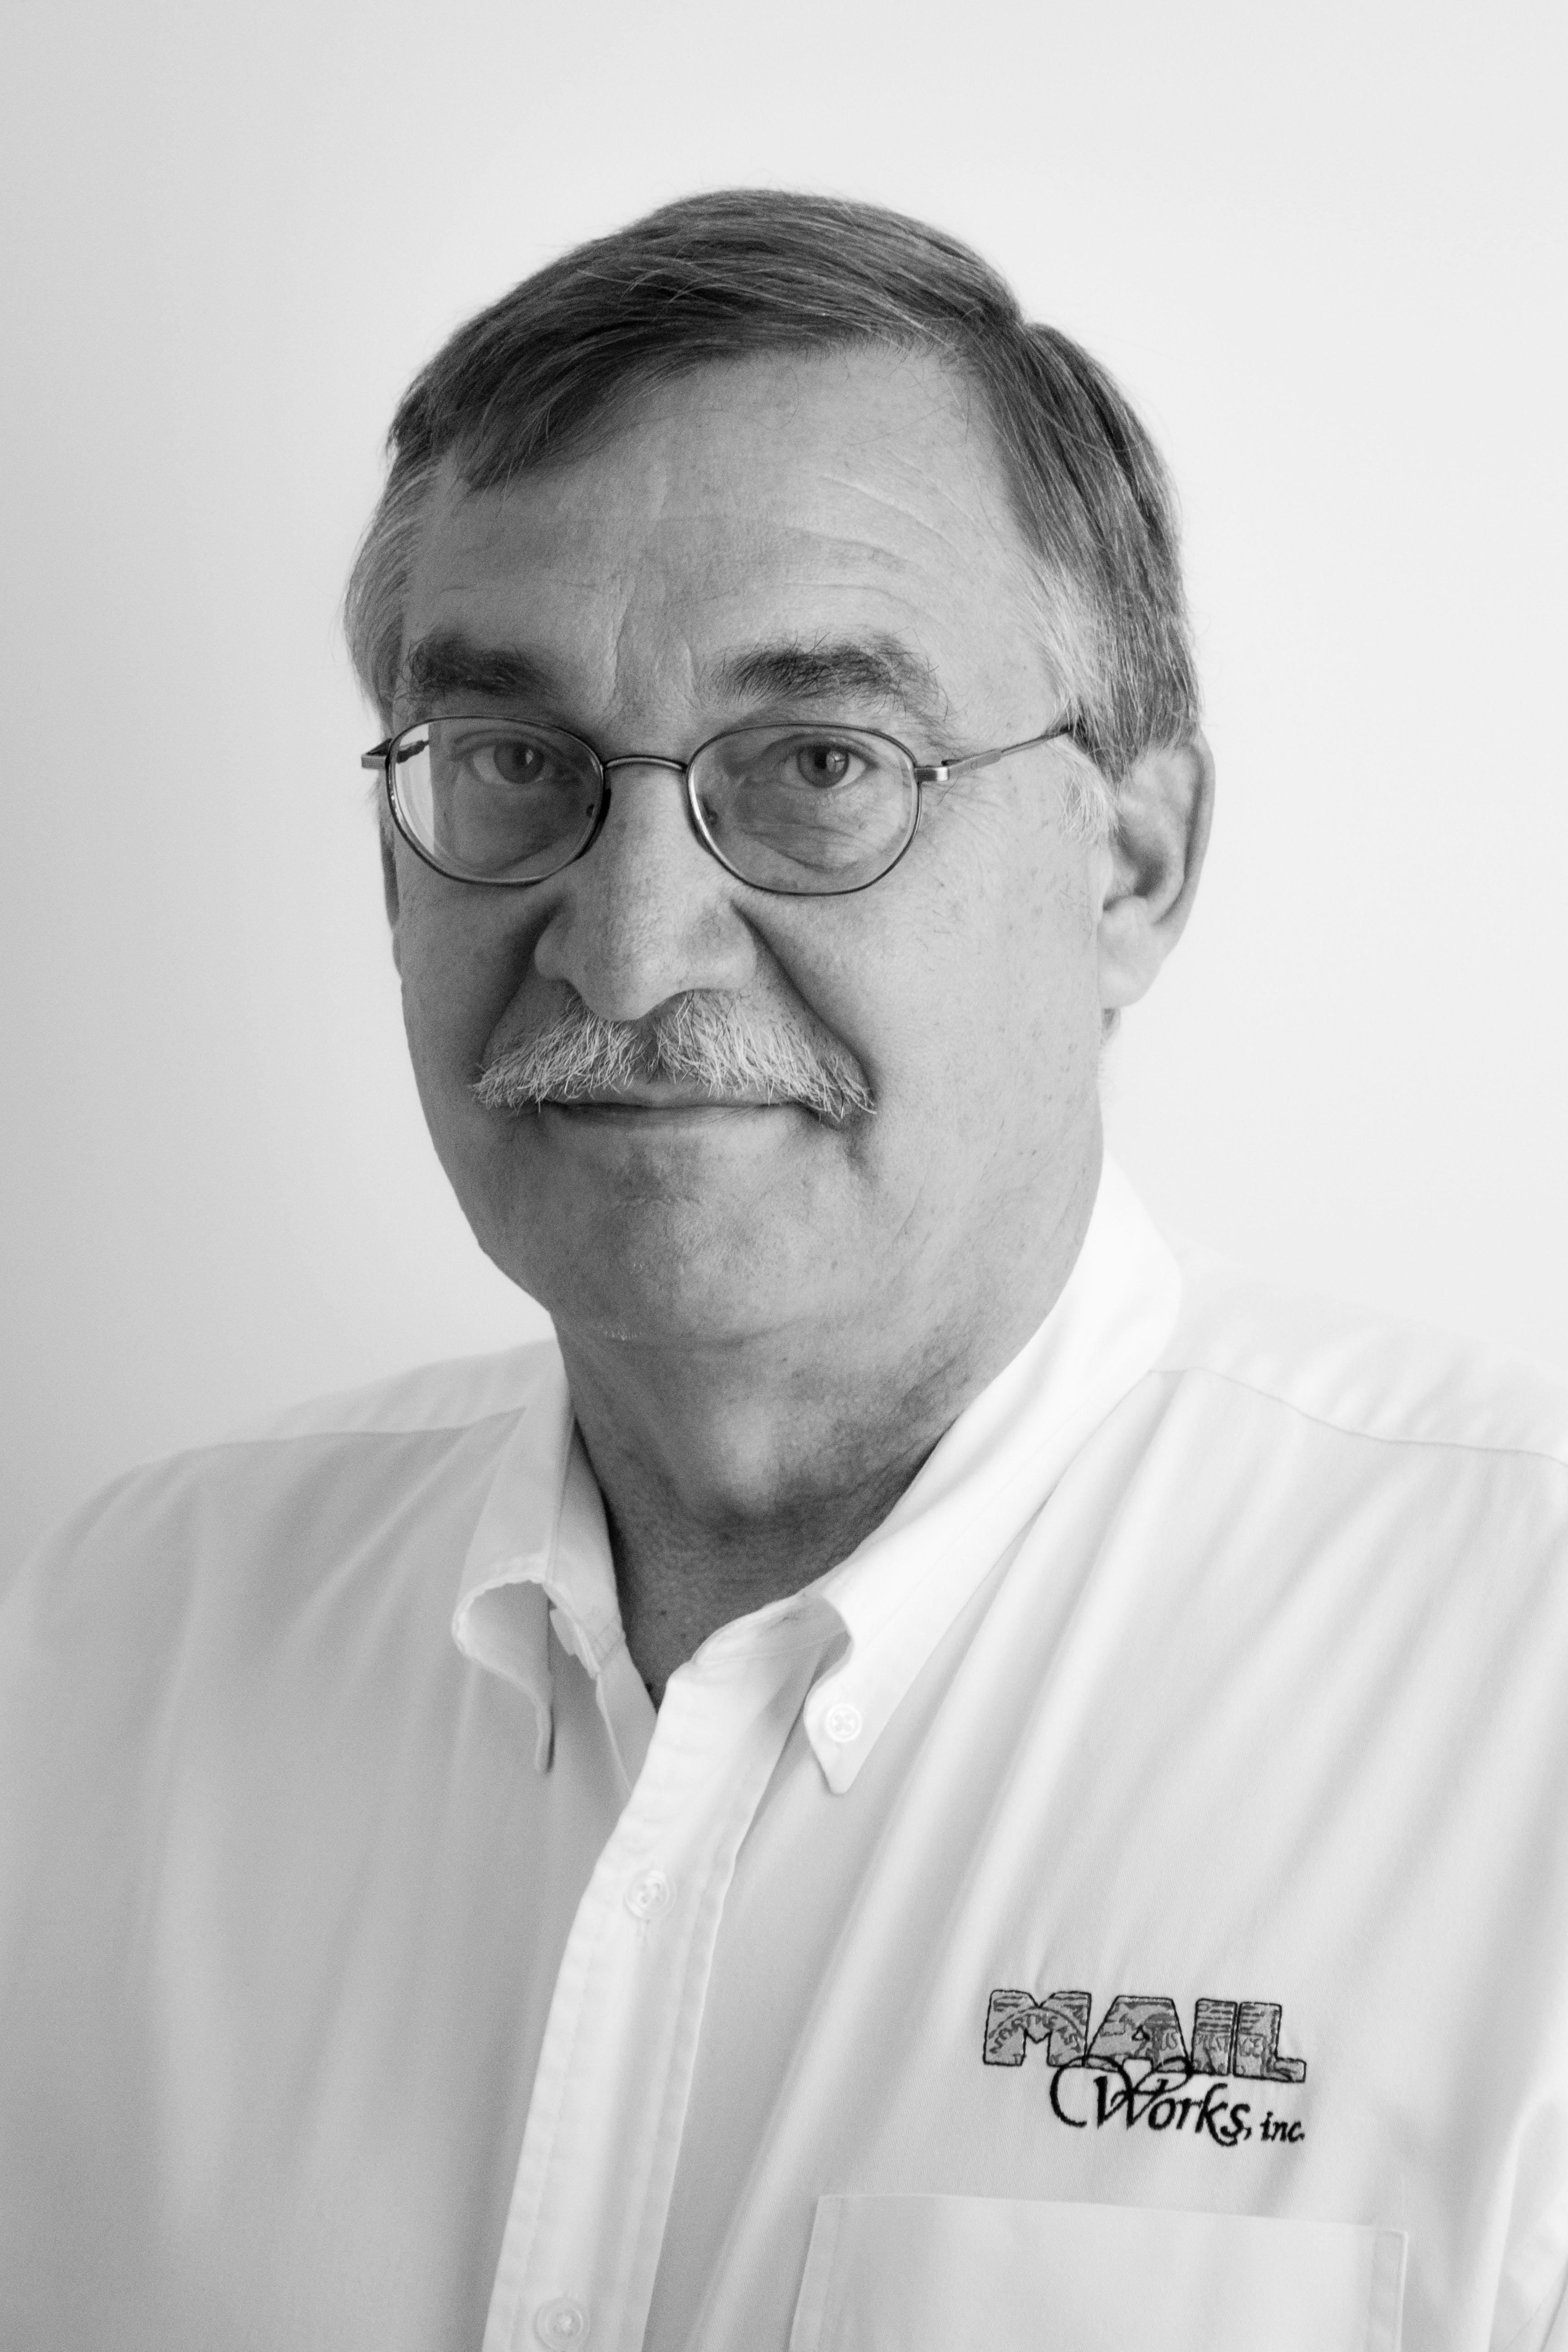 John Krueger